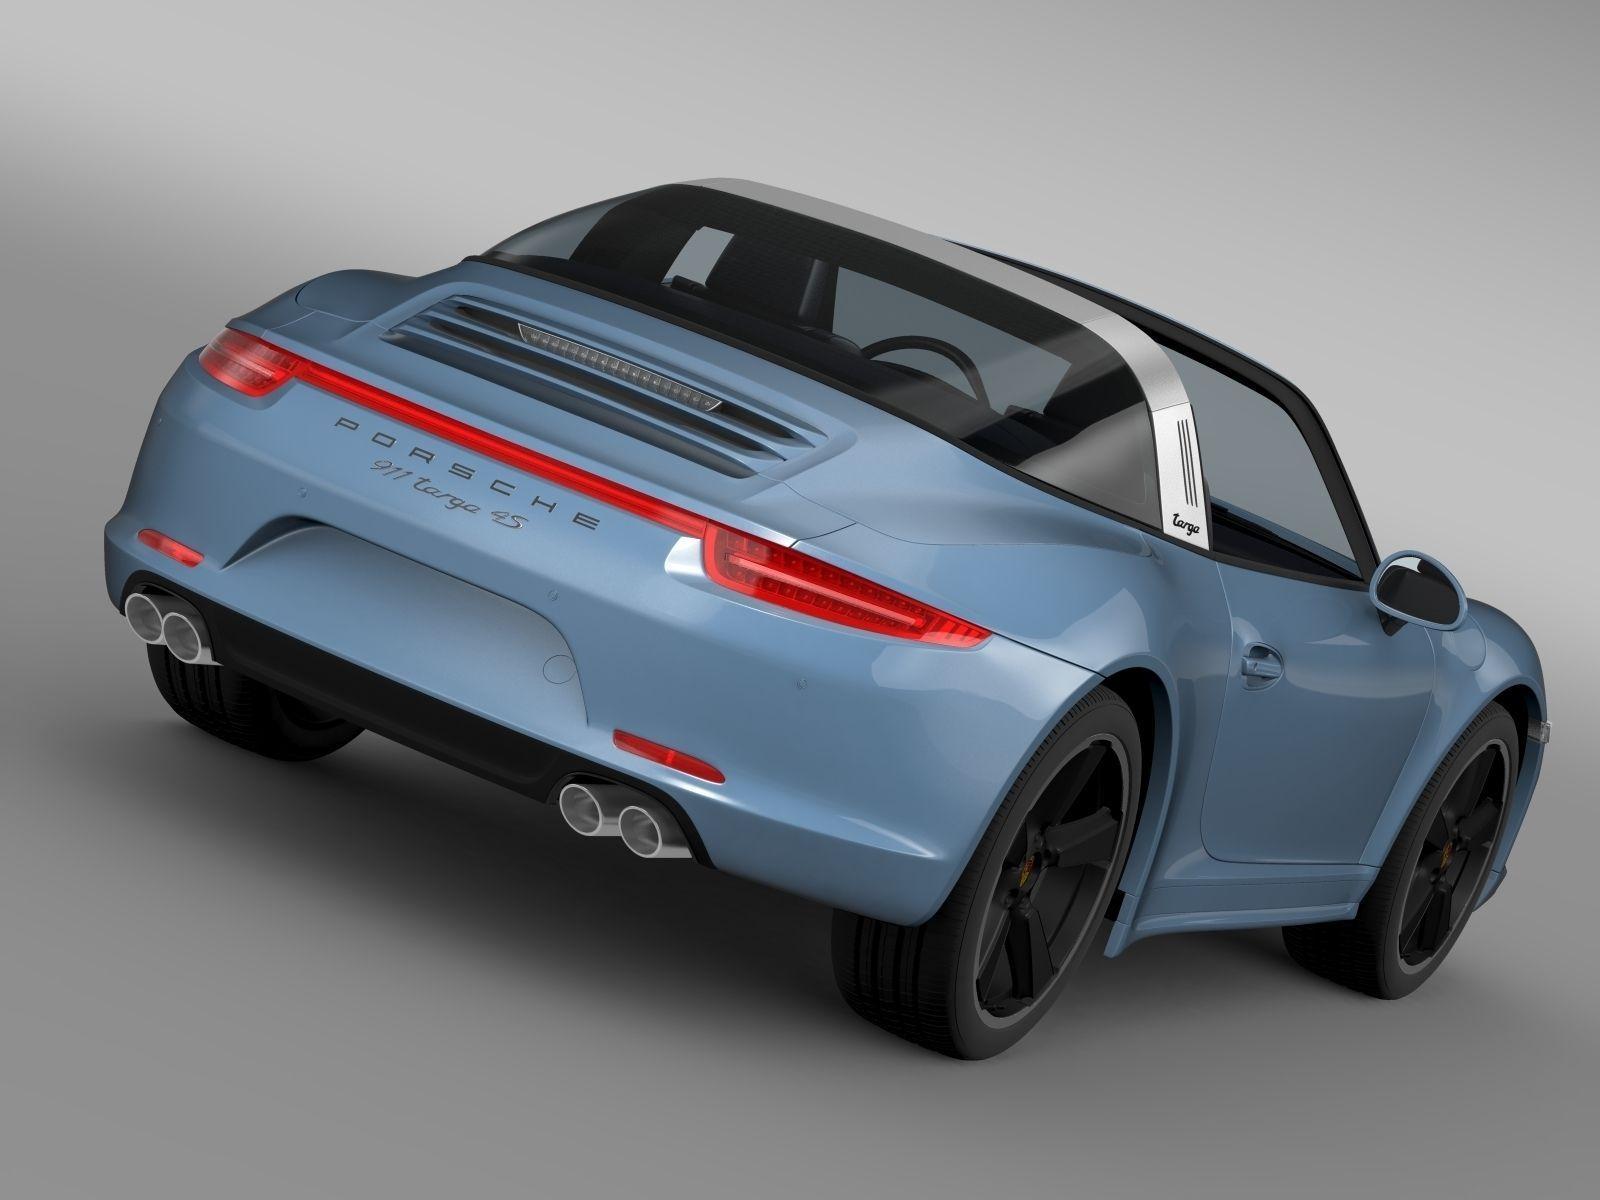 911 Targa 4S >> Porsche 911 Targa 4s Exclusive 2015 3d Model